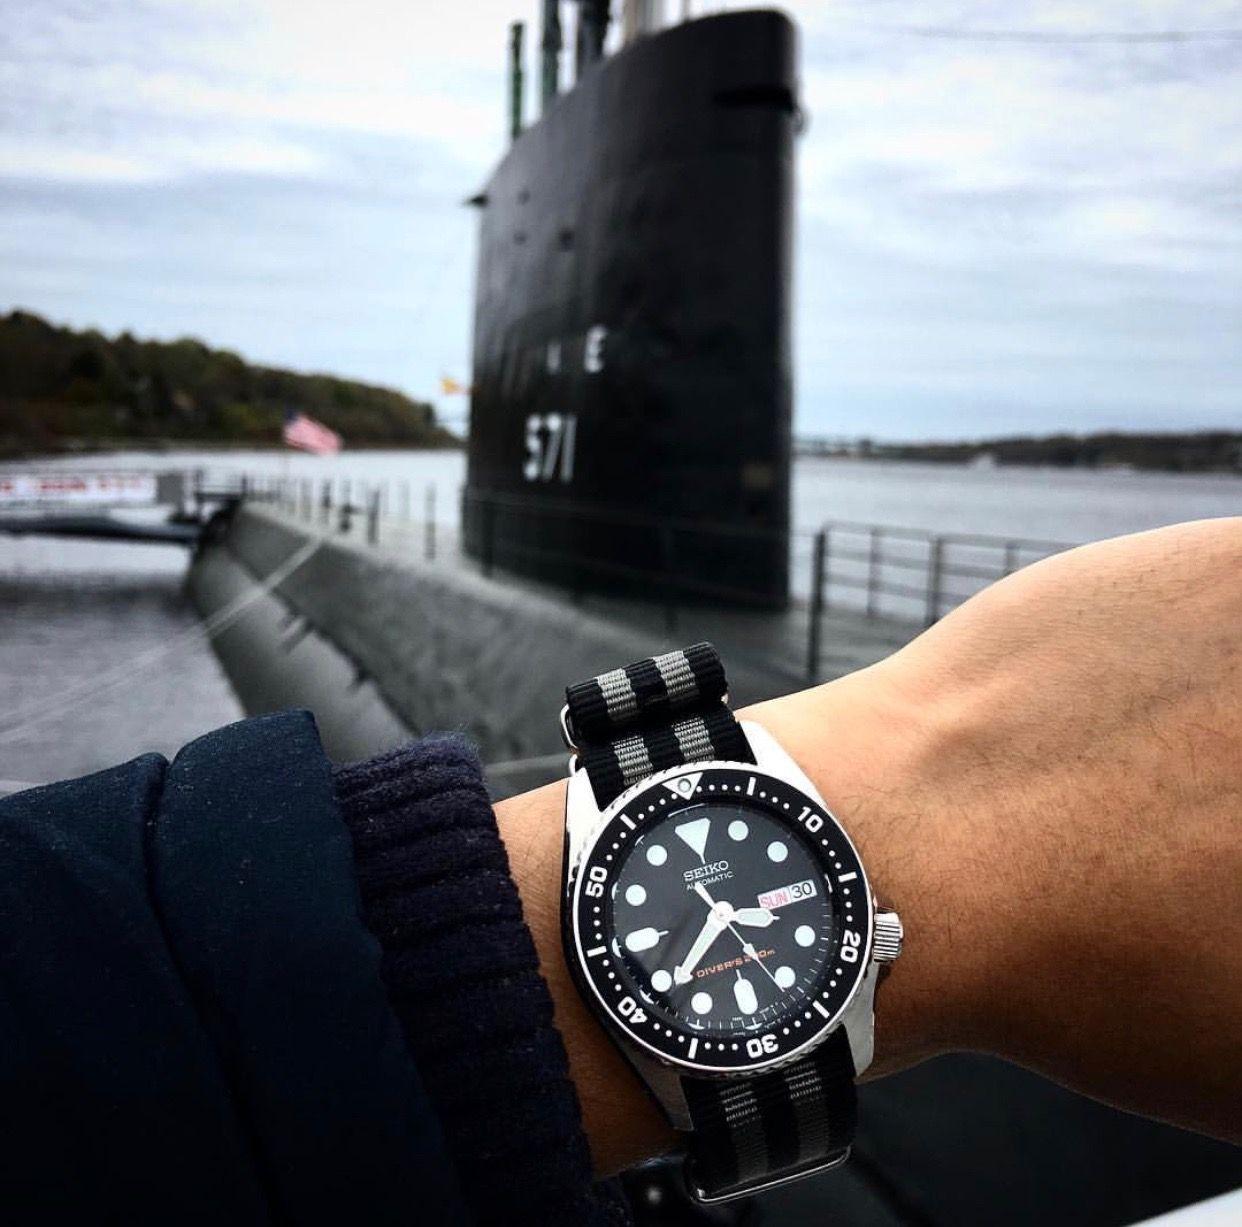 Uhren armband - luxuryswisswatchesclock.blogspot.com